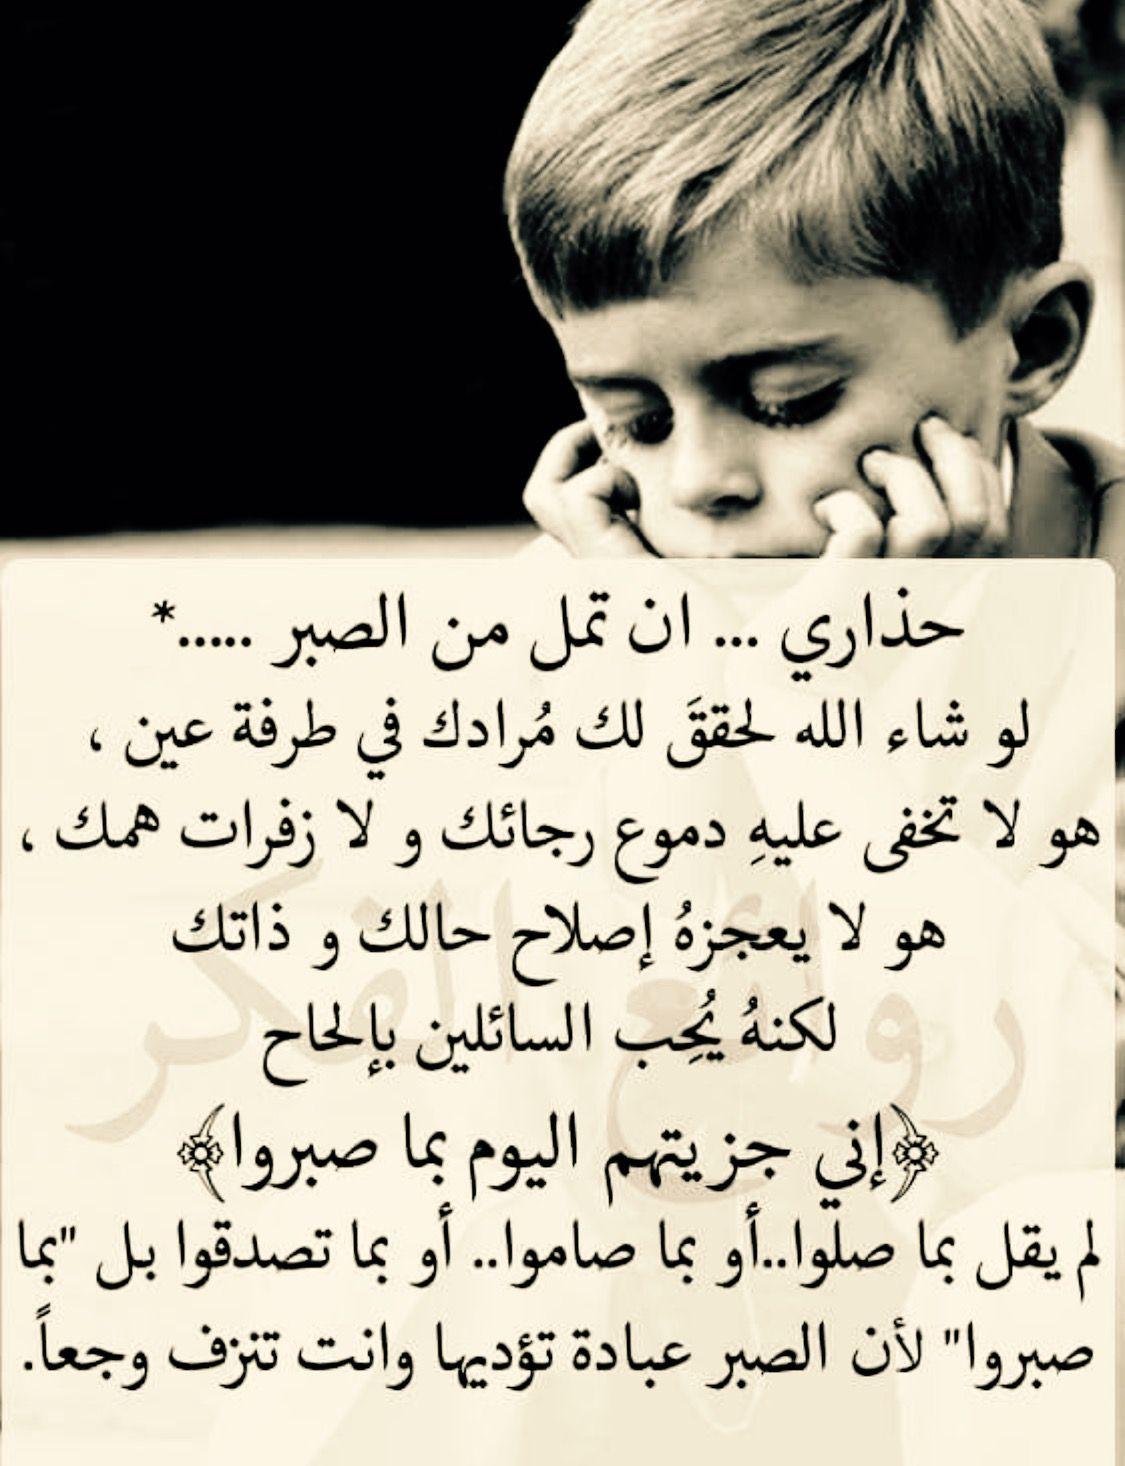 Desertrose و إ ذ ا نفذ الصبر مني سامحني يا ربي Cool Words Quran Quotes Thoughts Quotes